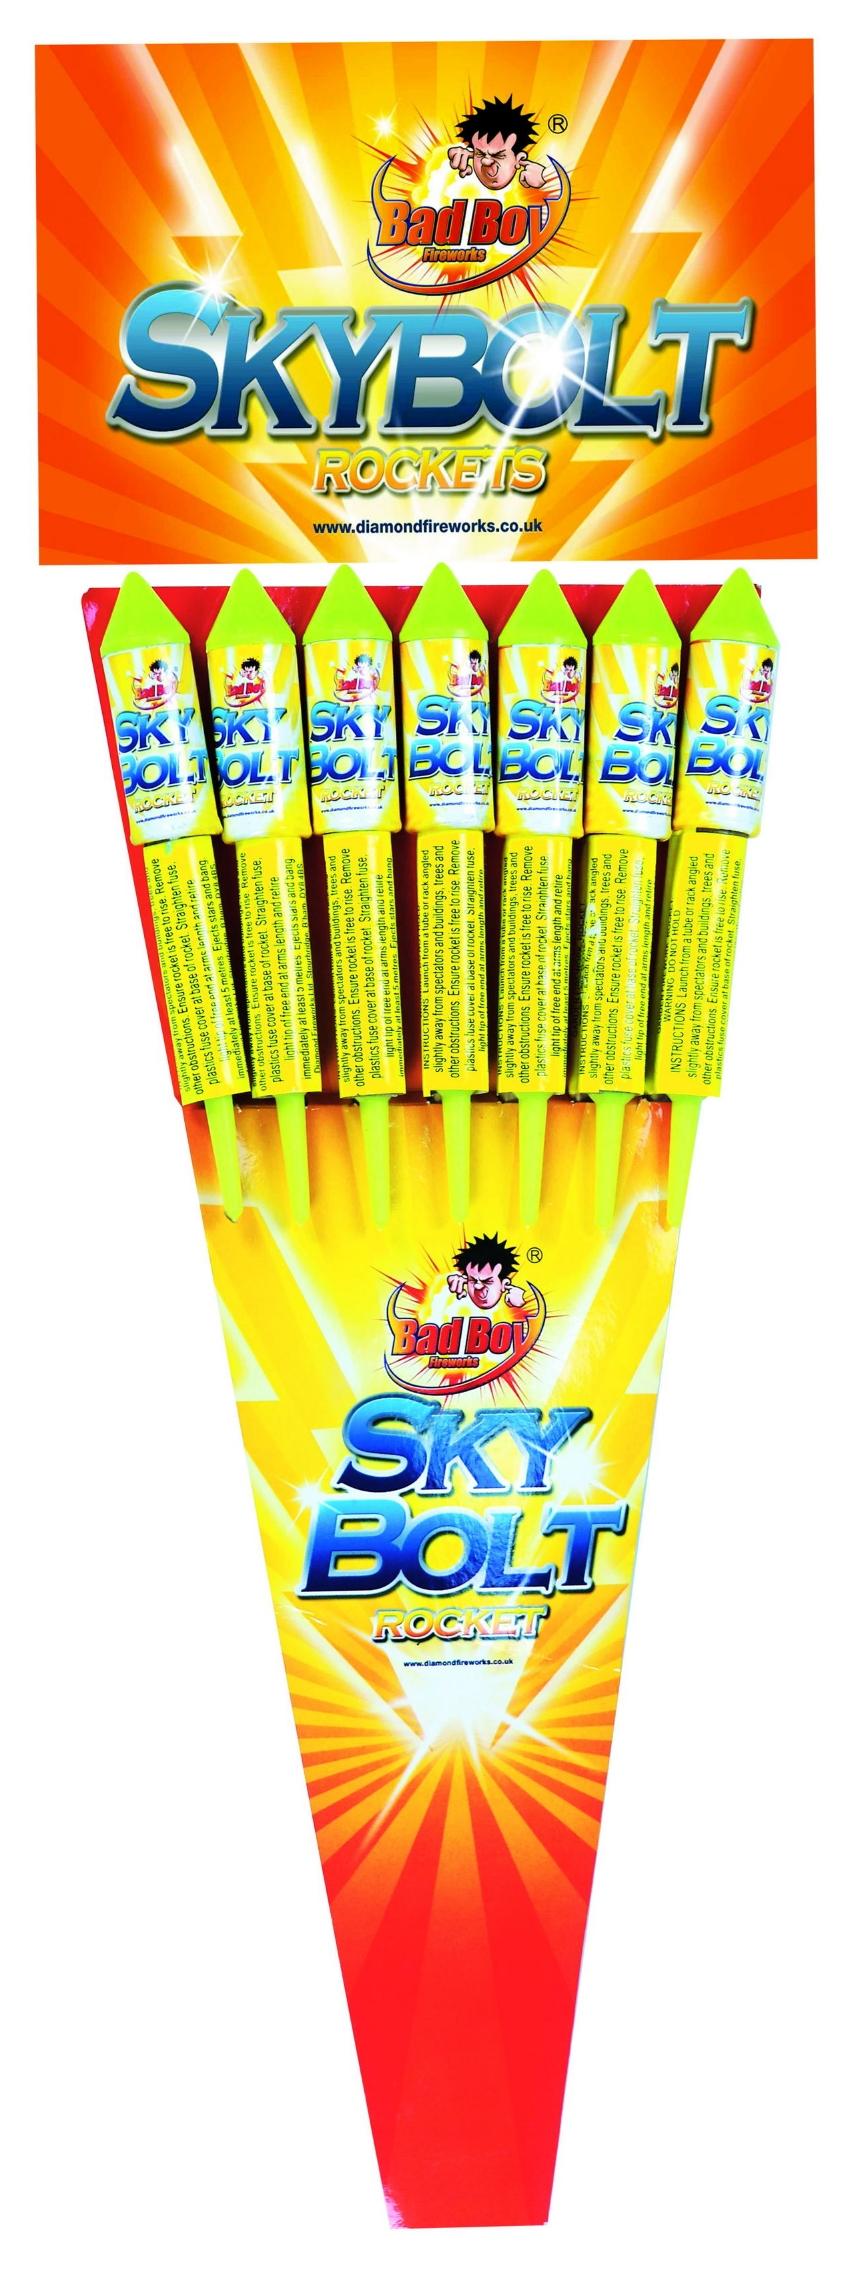 Skybolt Rockets 7pk - RRP £11.49